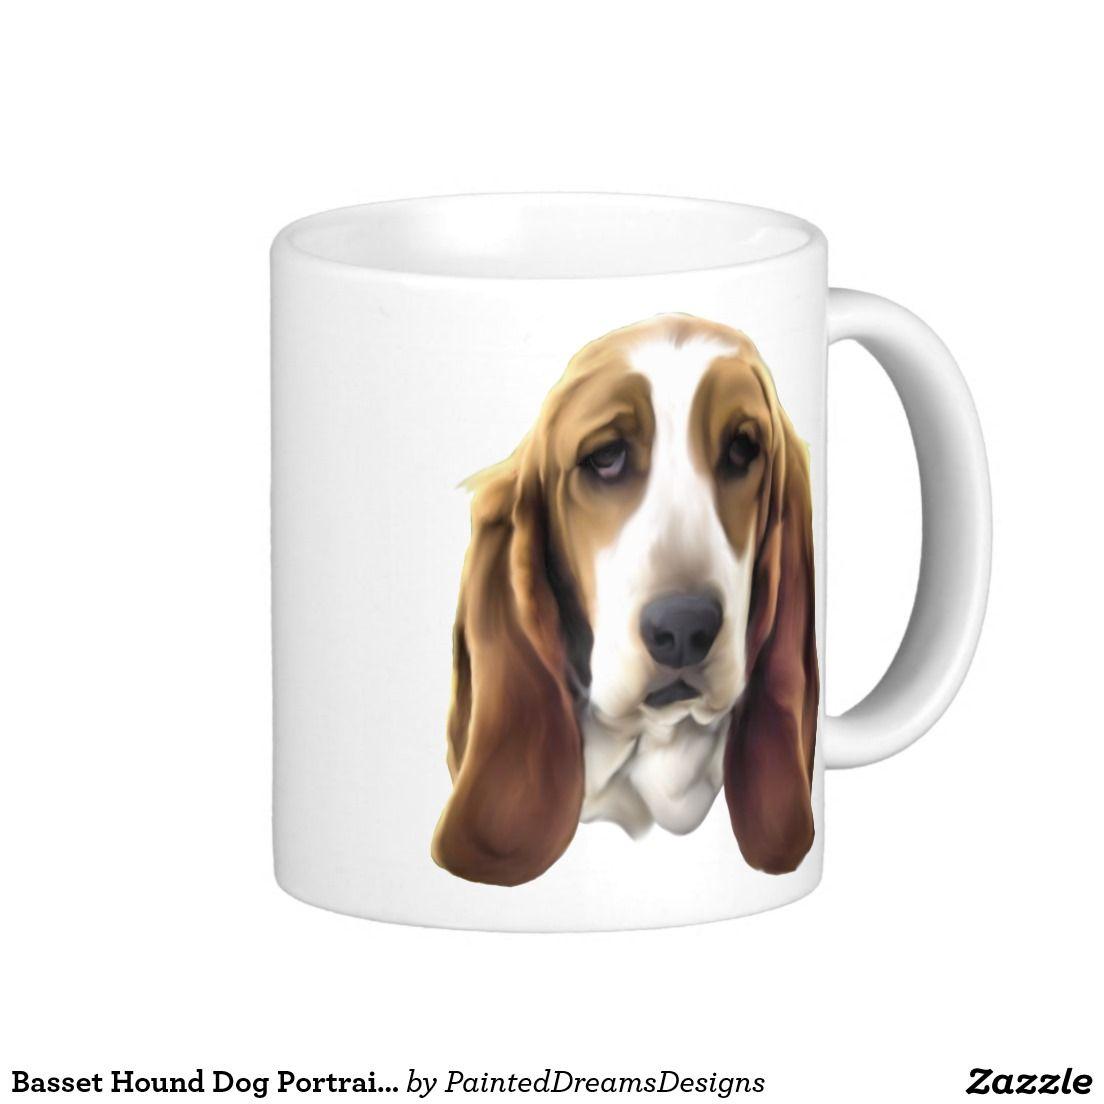 Basset Hound Dog Coffee Mug Hound dog